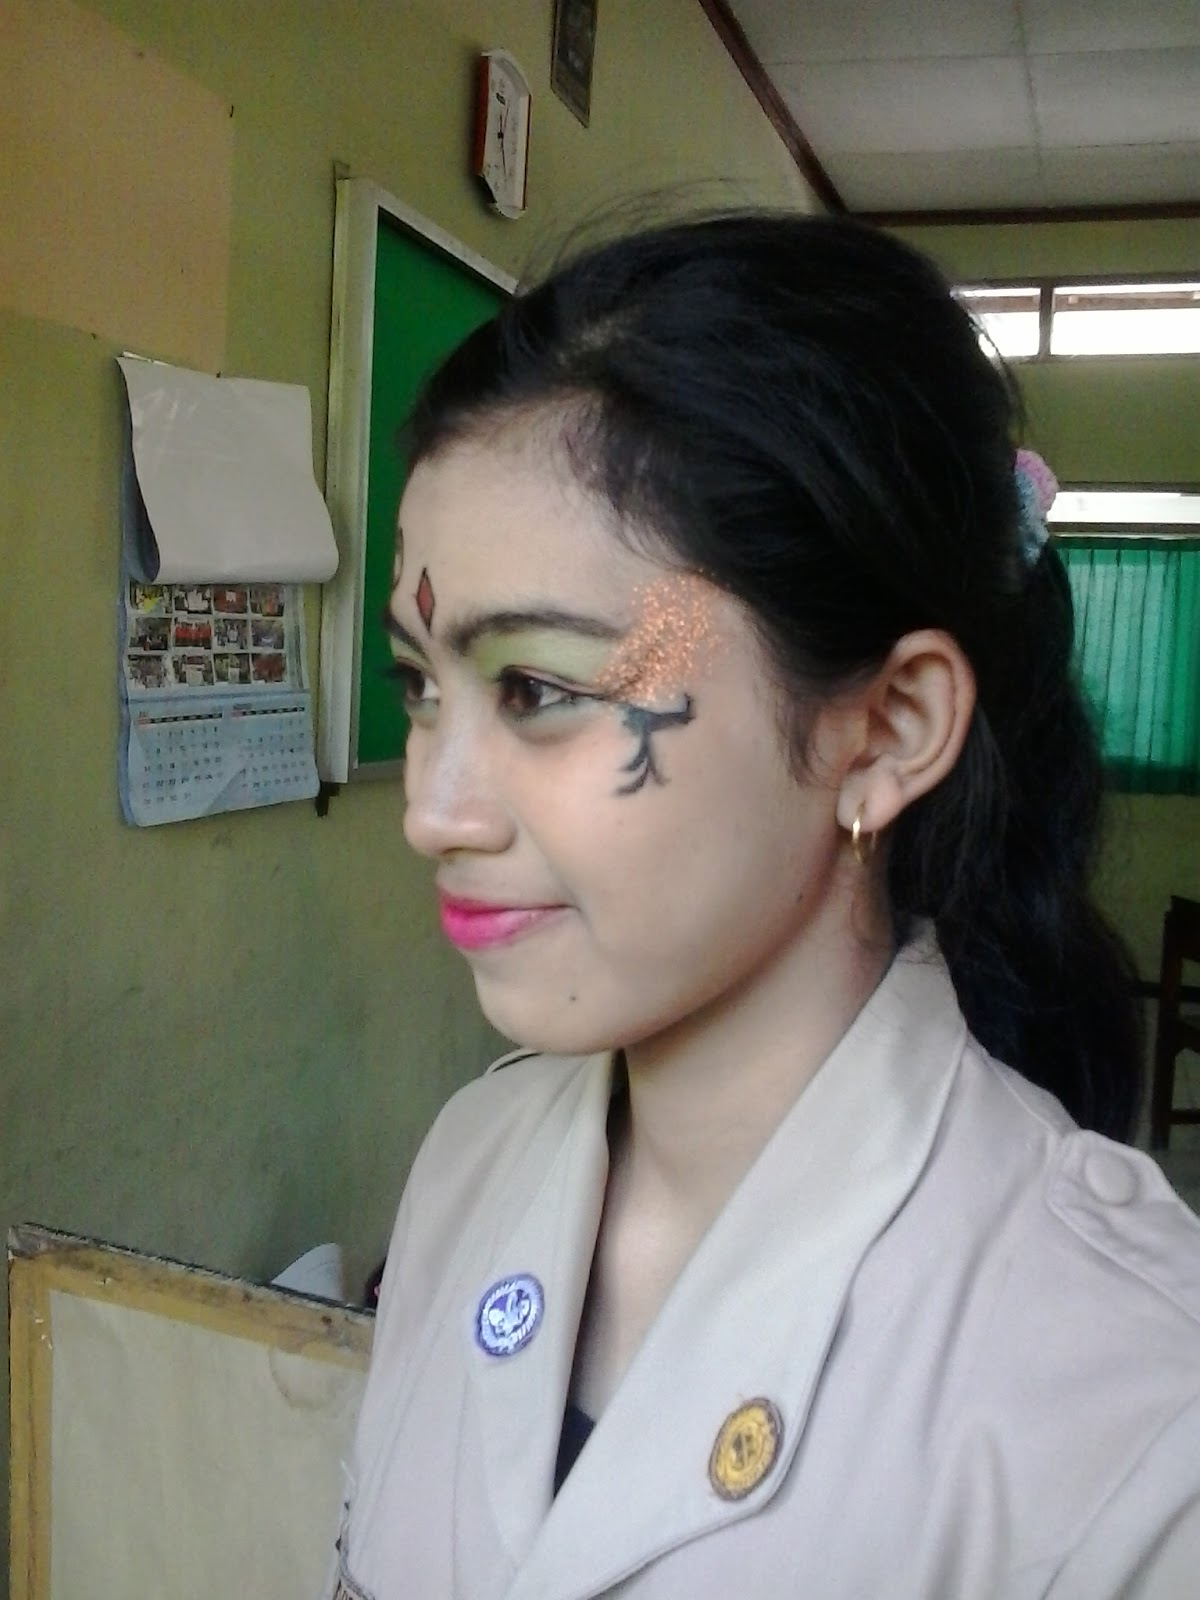 Devy Septyowati Agustus 2013